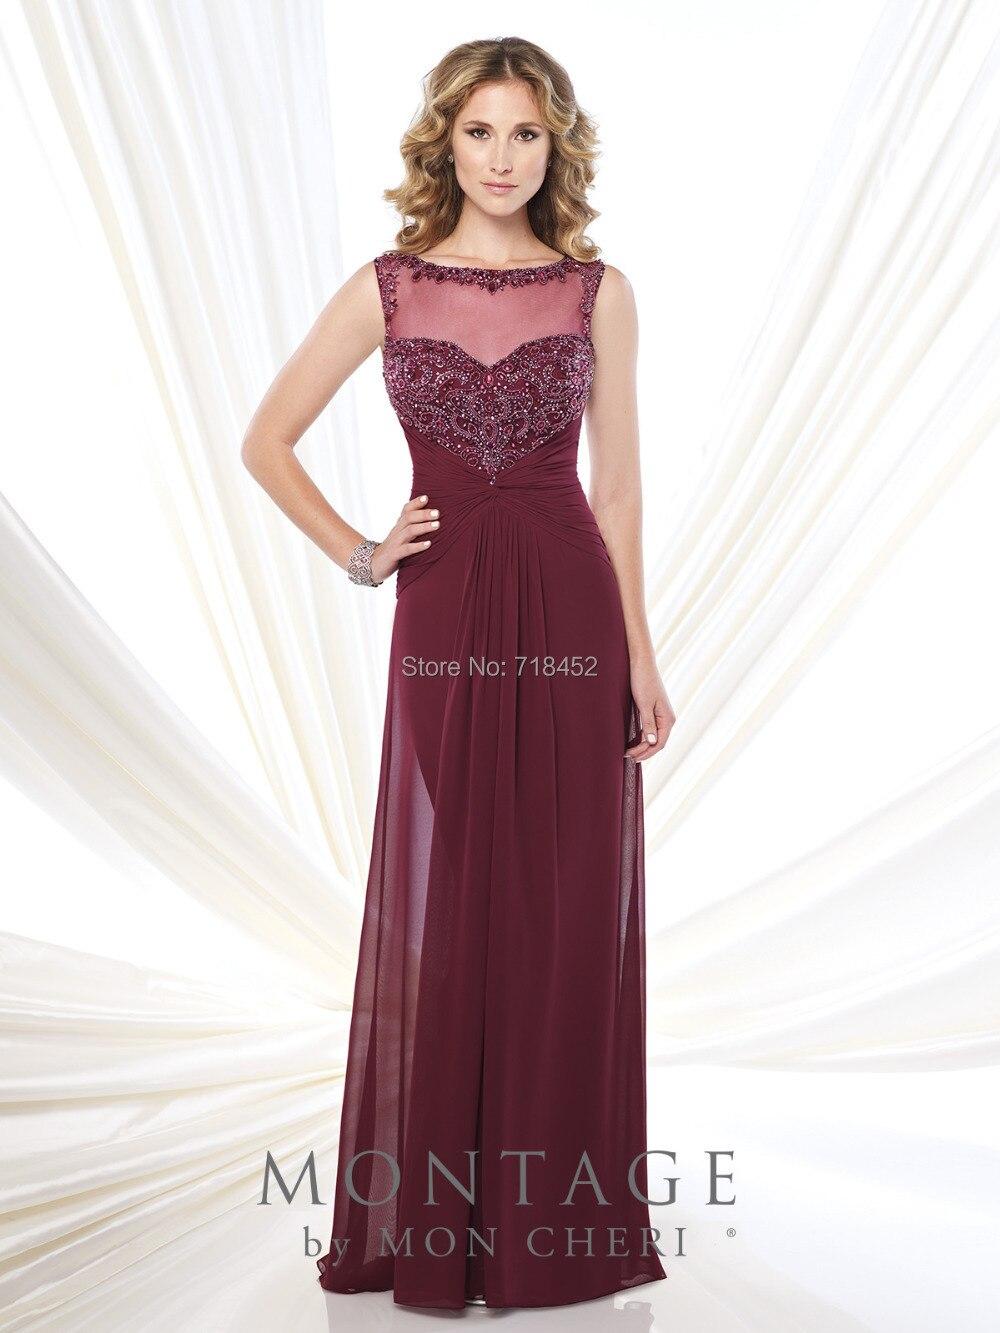 Fashion Design Burgundy Chiffon Mother Of Bride Dress For Beach Wedding Sheer Neck Beading Formal Party